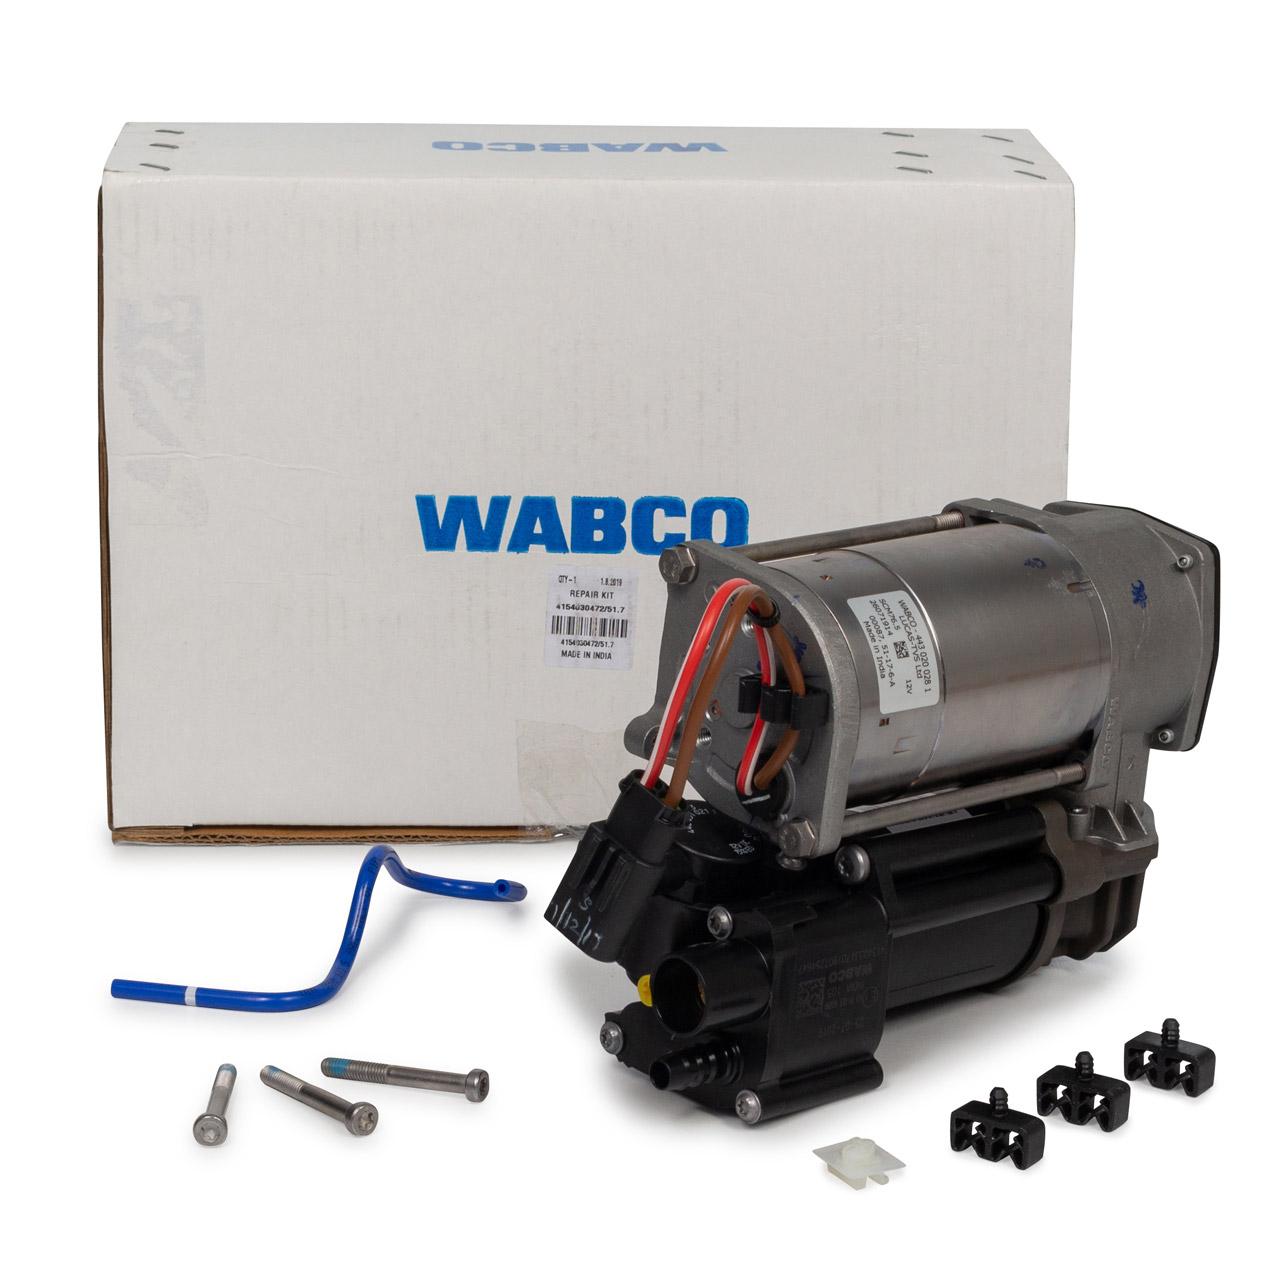 WABCO Kompressor Luftfederung Luftkompressor BMW X5 F15 F85 X6 F16 F86 37206875177